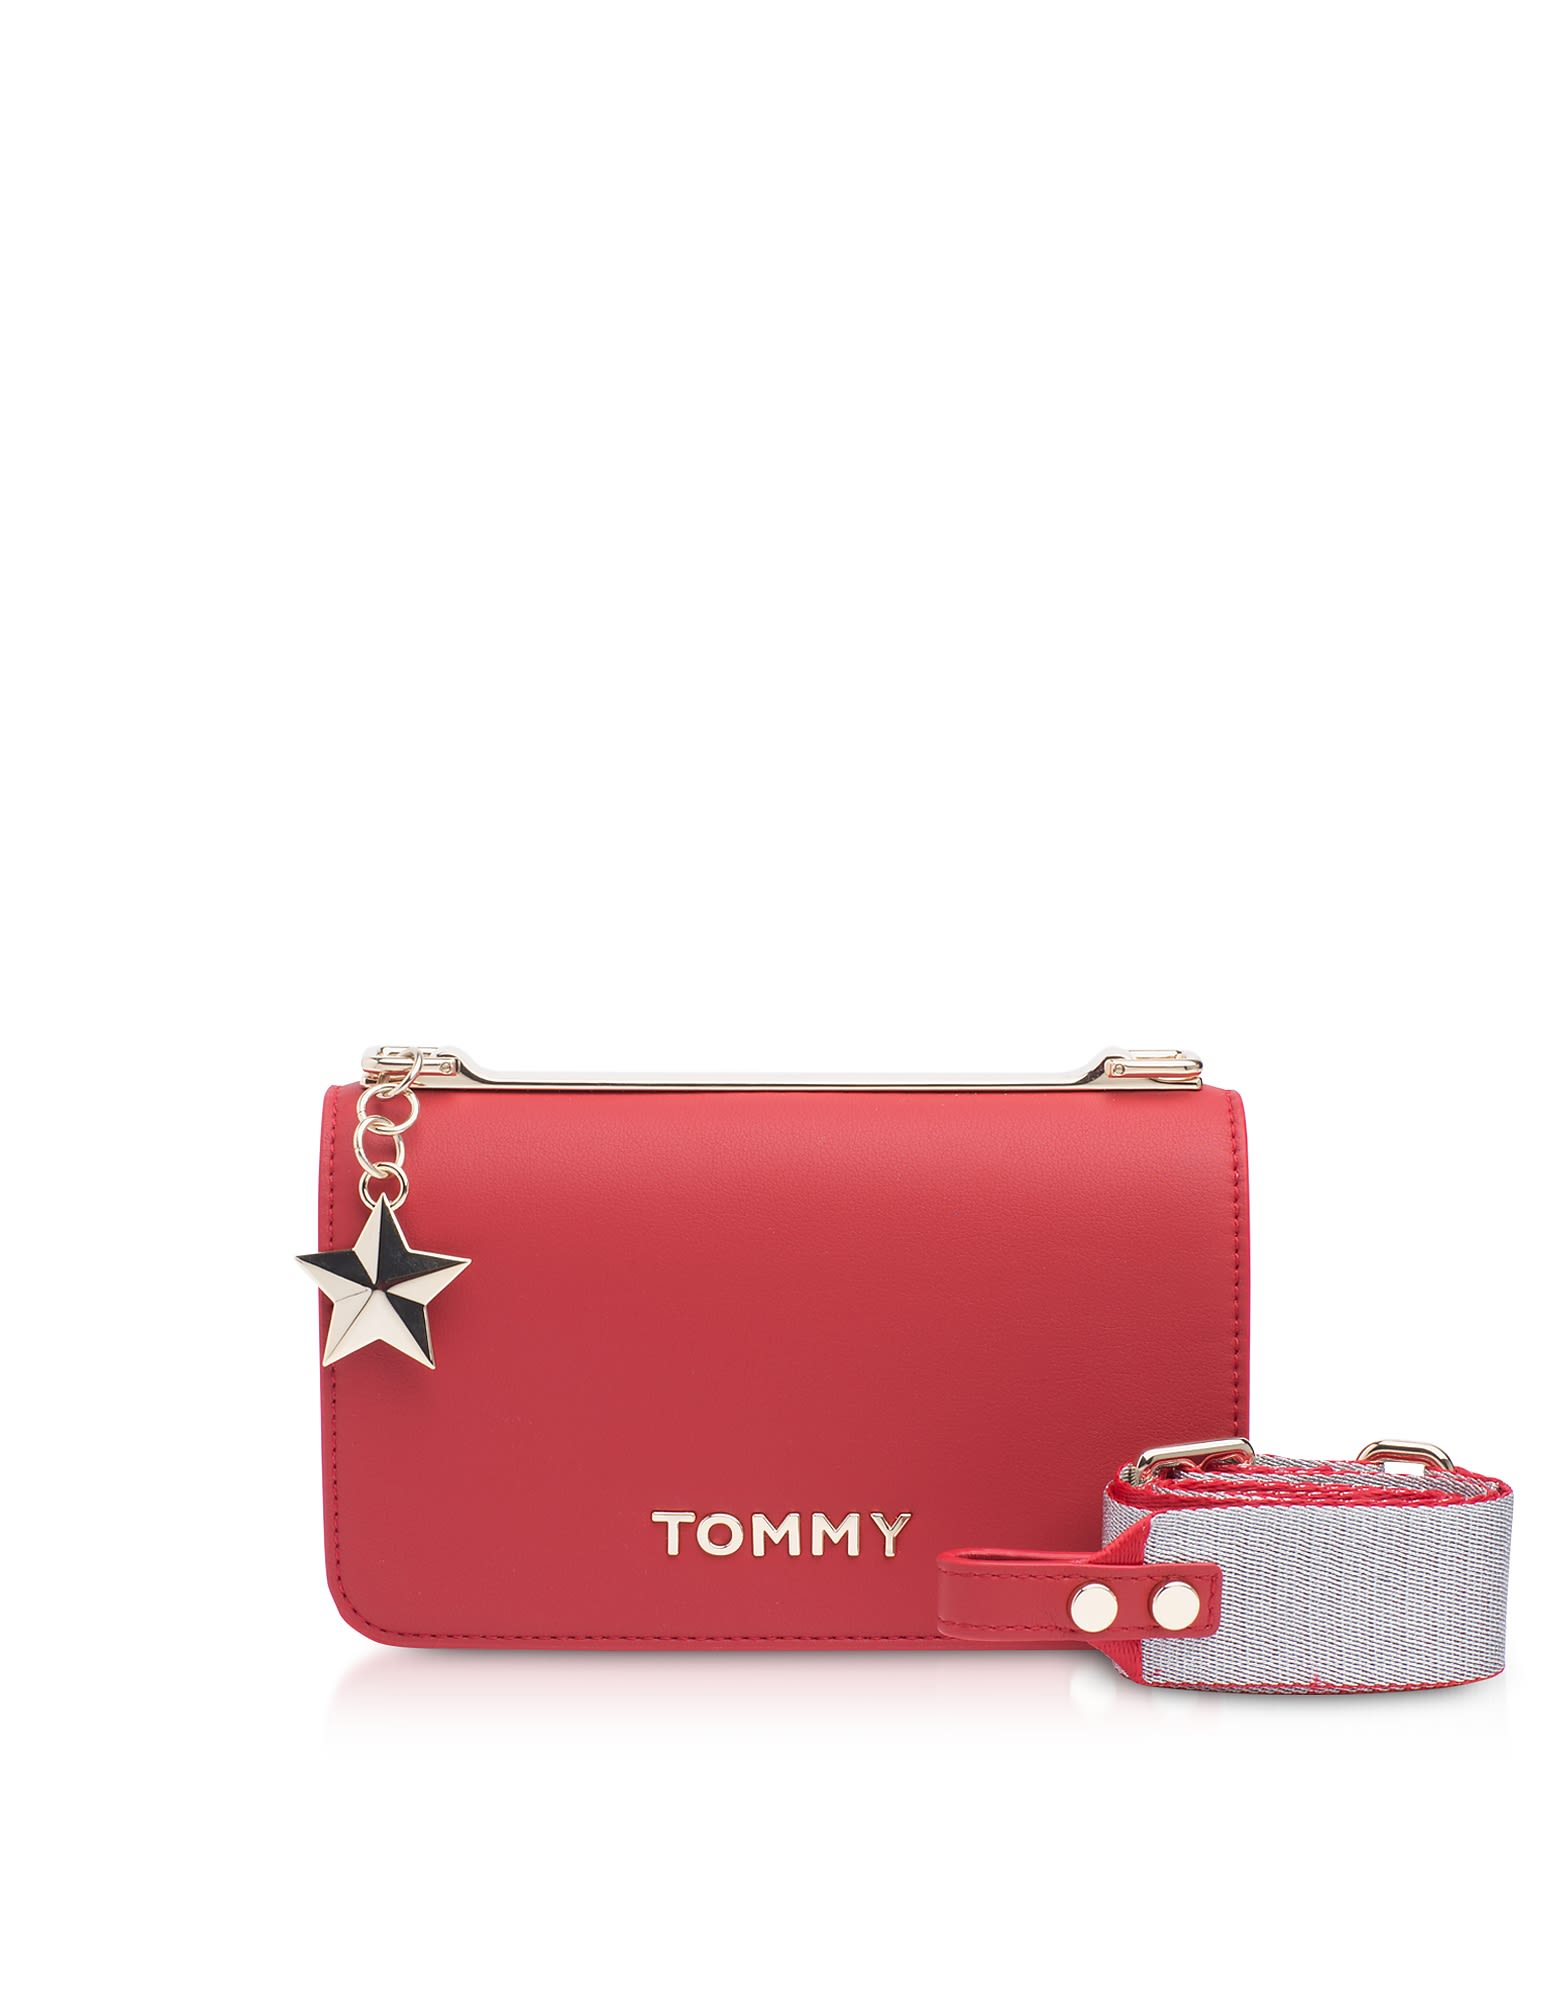 a823ea61152e Tommy Hilfiger Tommy Hilfiger Tommy Statement Crossbody Bag - Red ...